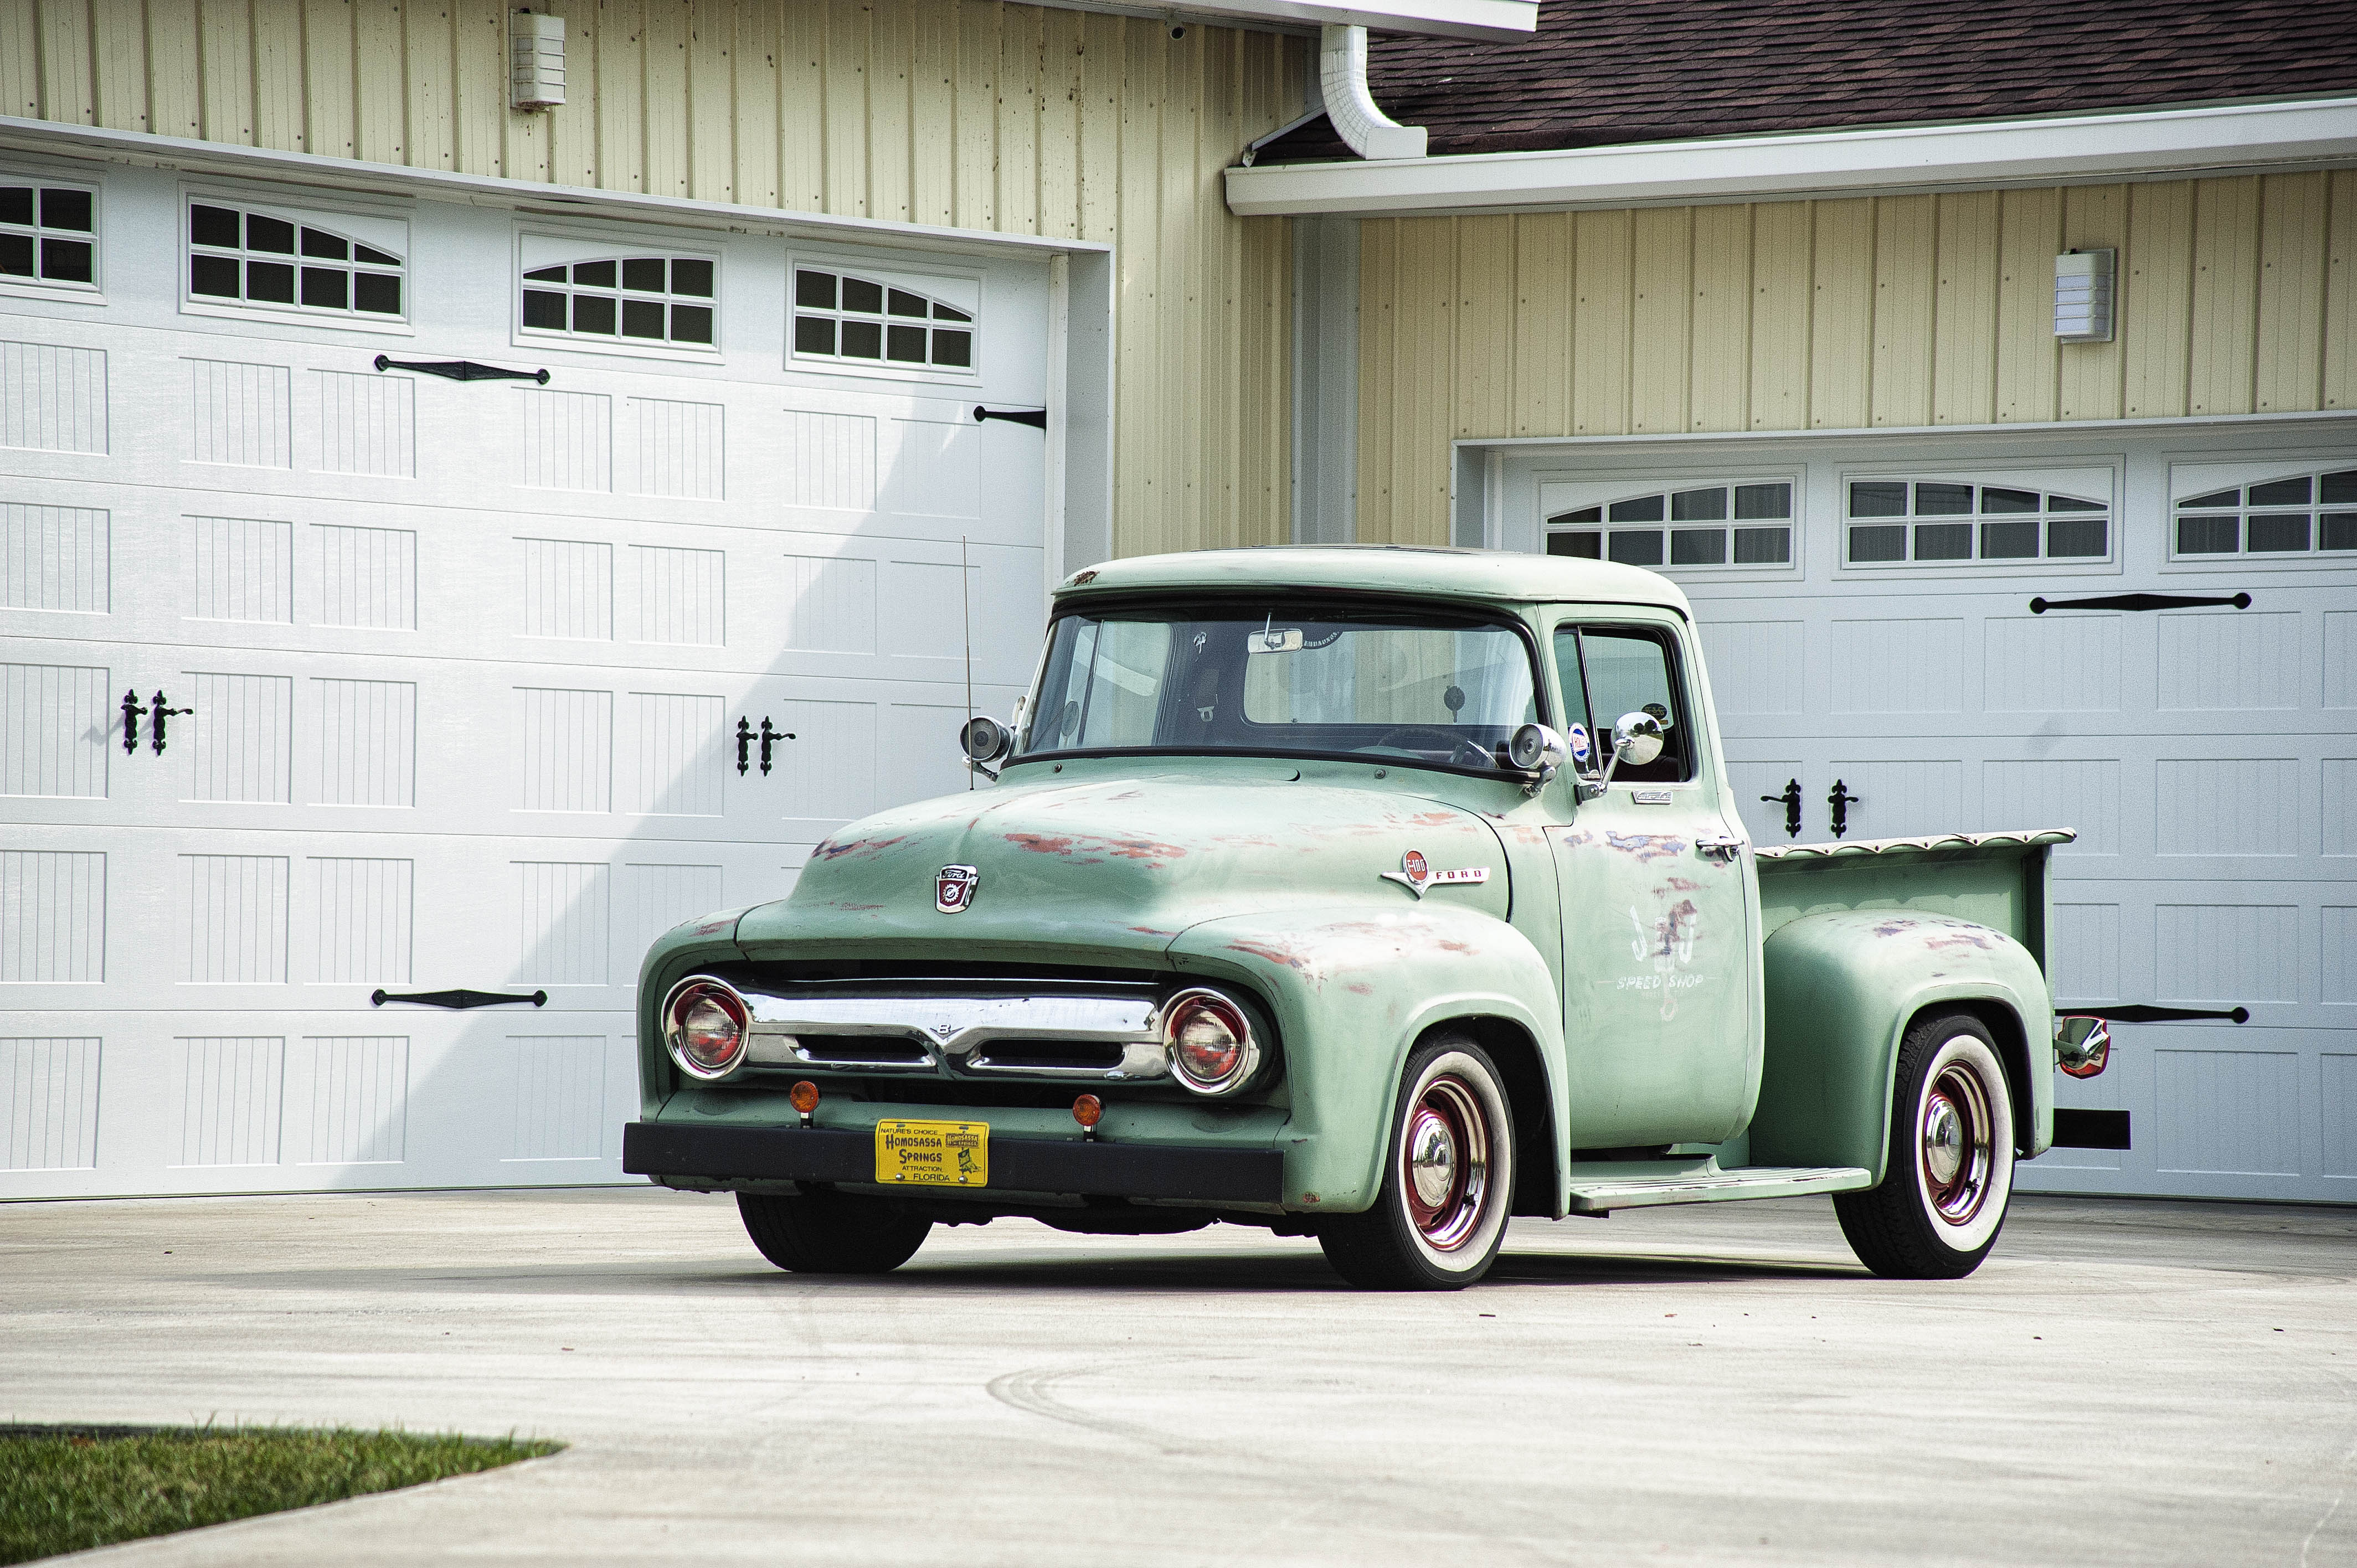 1956 Ford F100 Rat Truck Southern Indiana Classics 1951 1952 F1 Pickup Call Jack 812 592 9287 Category Trucks